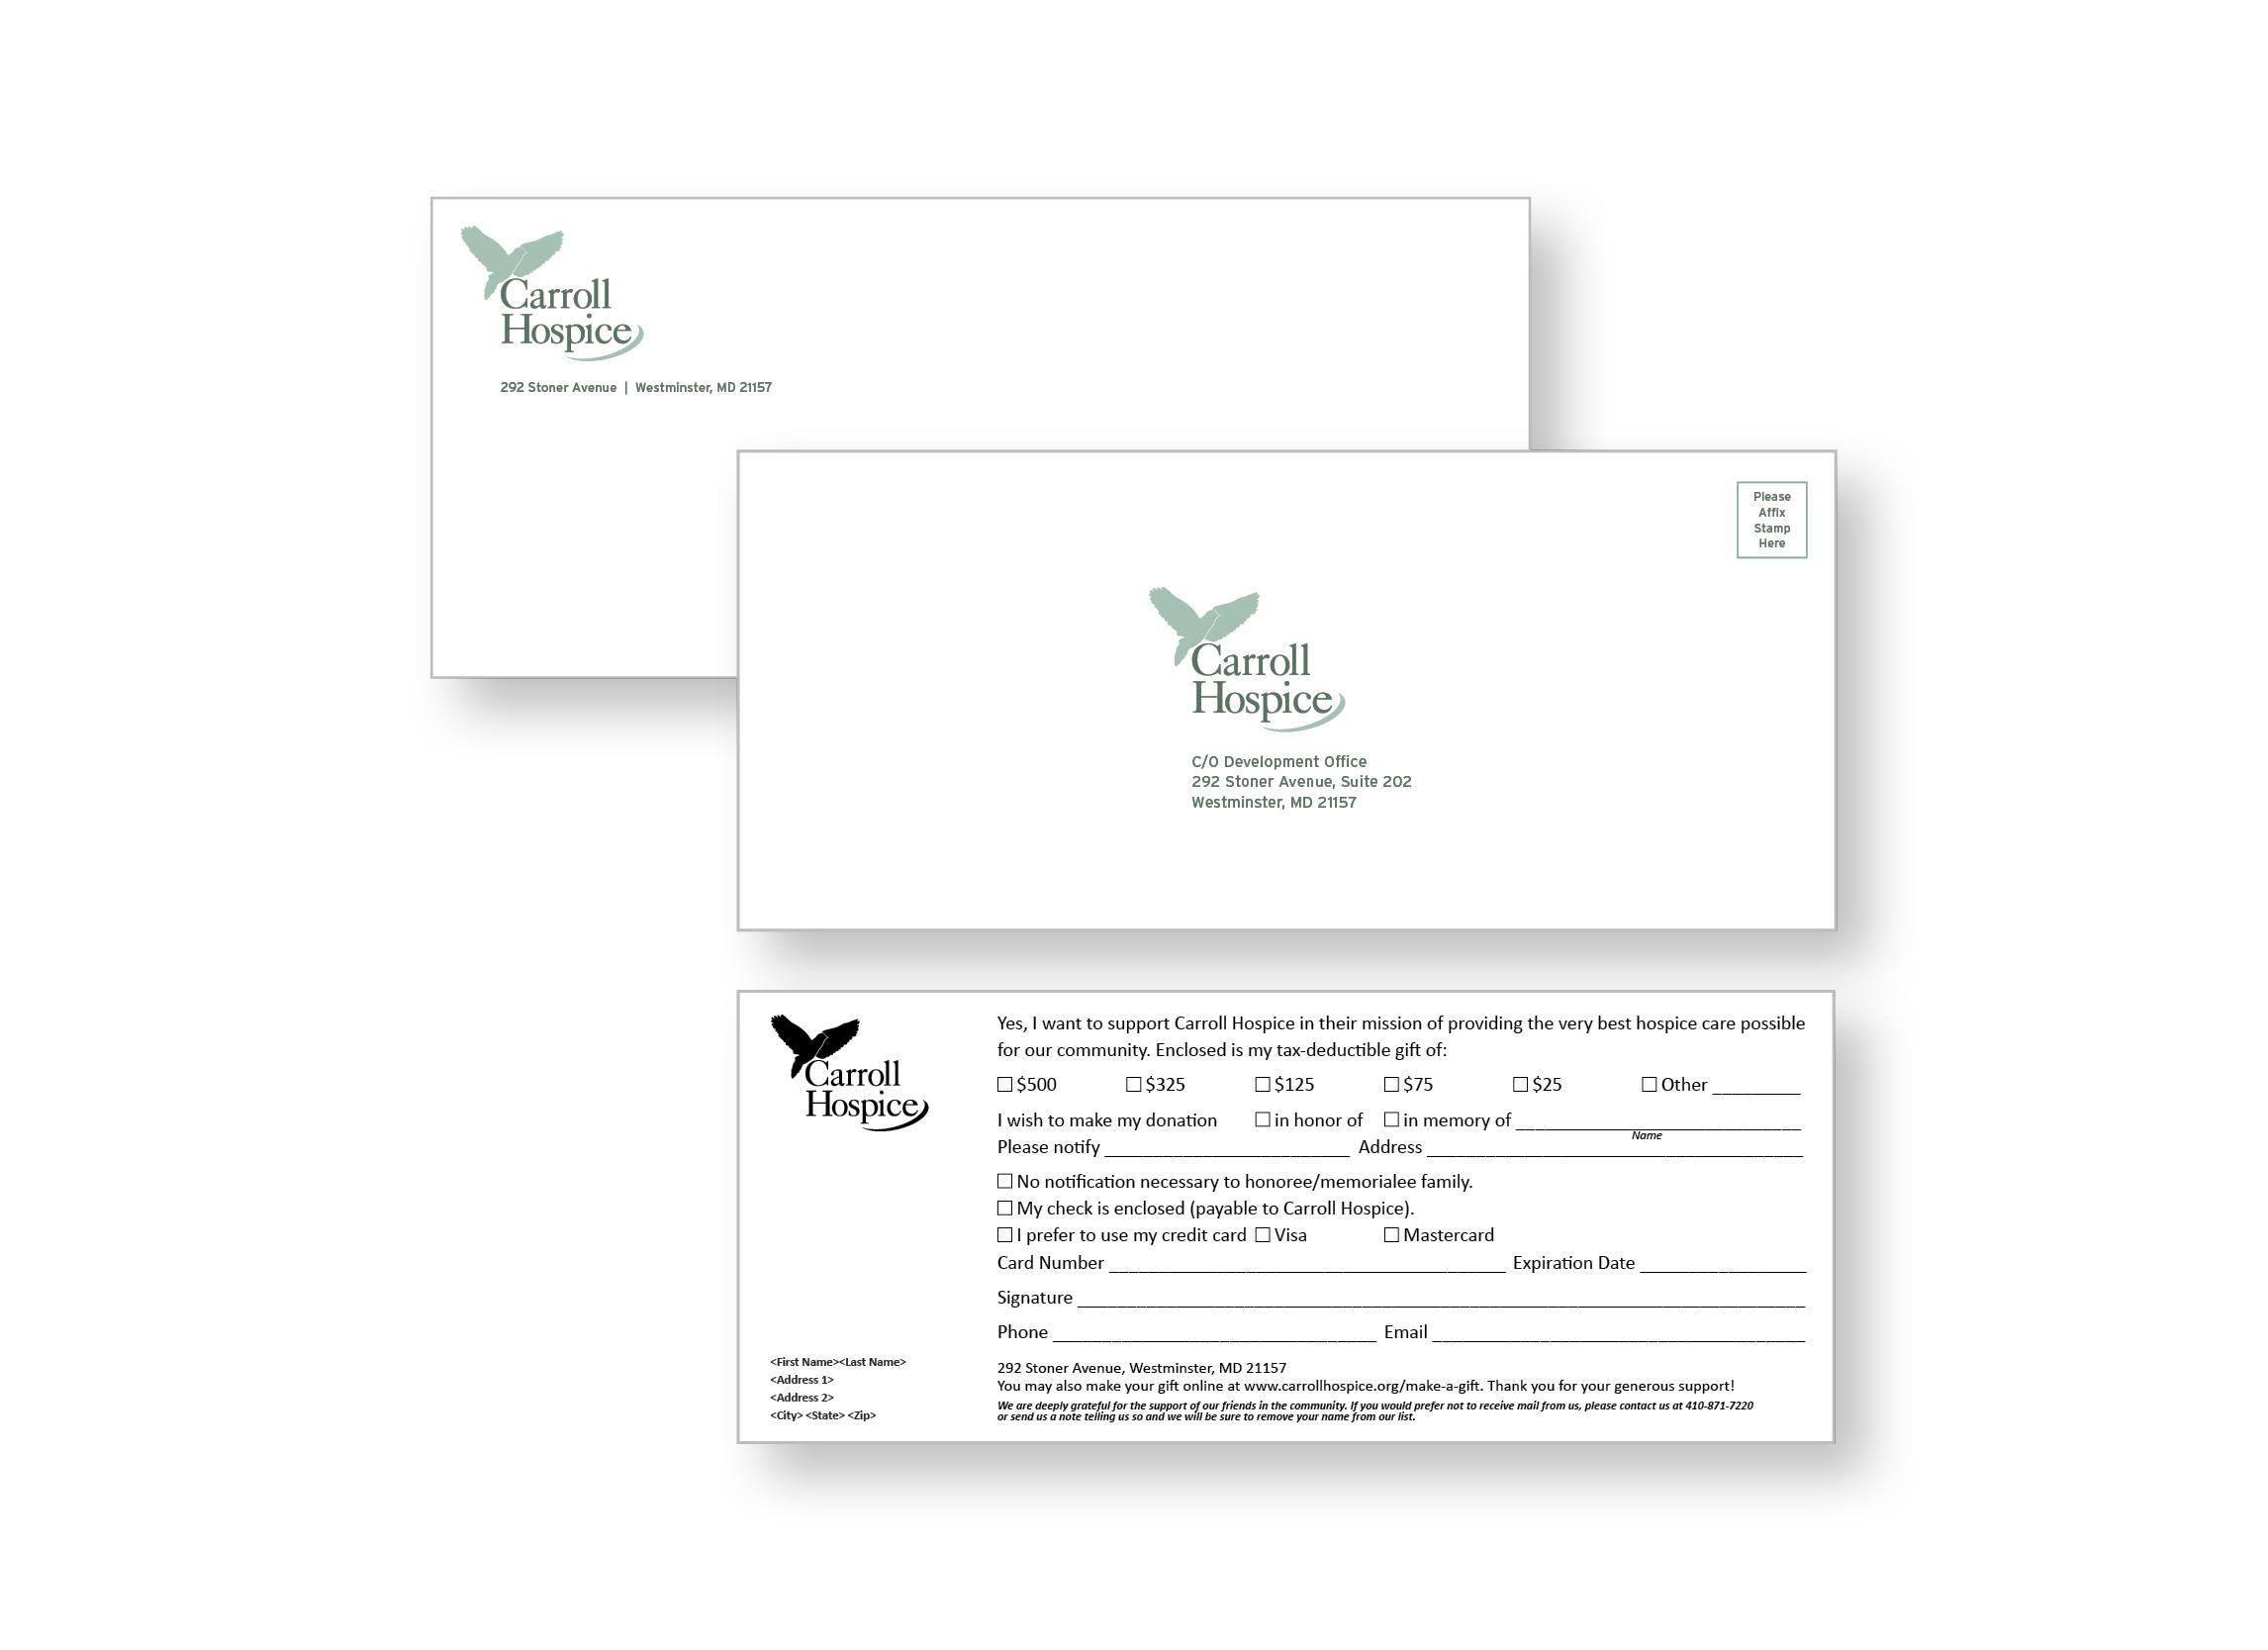 Carroll Hospice donation card